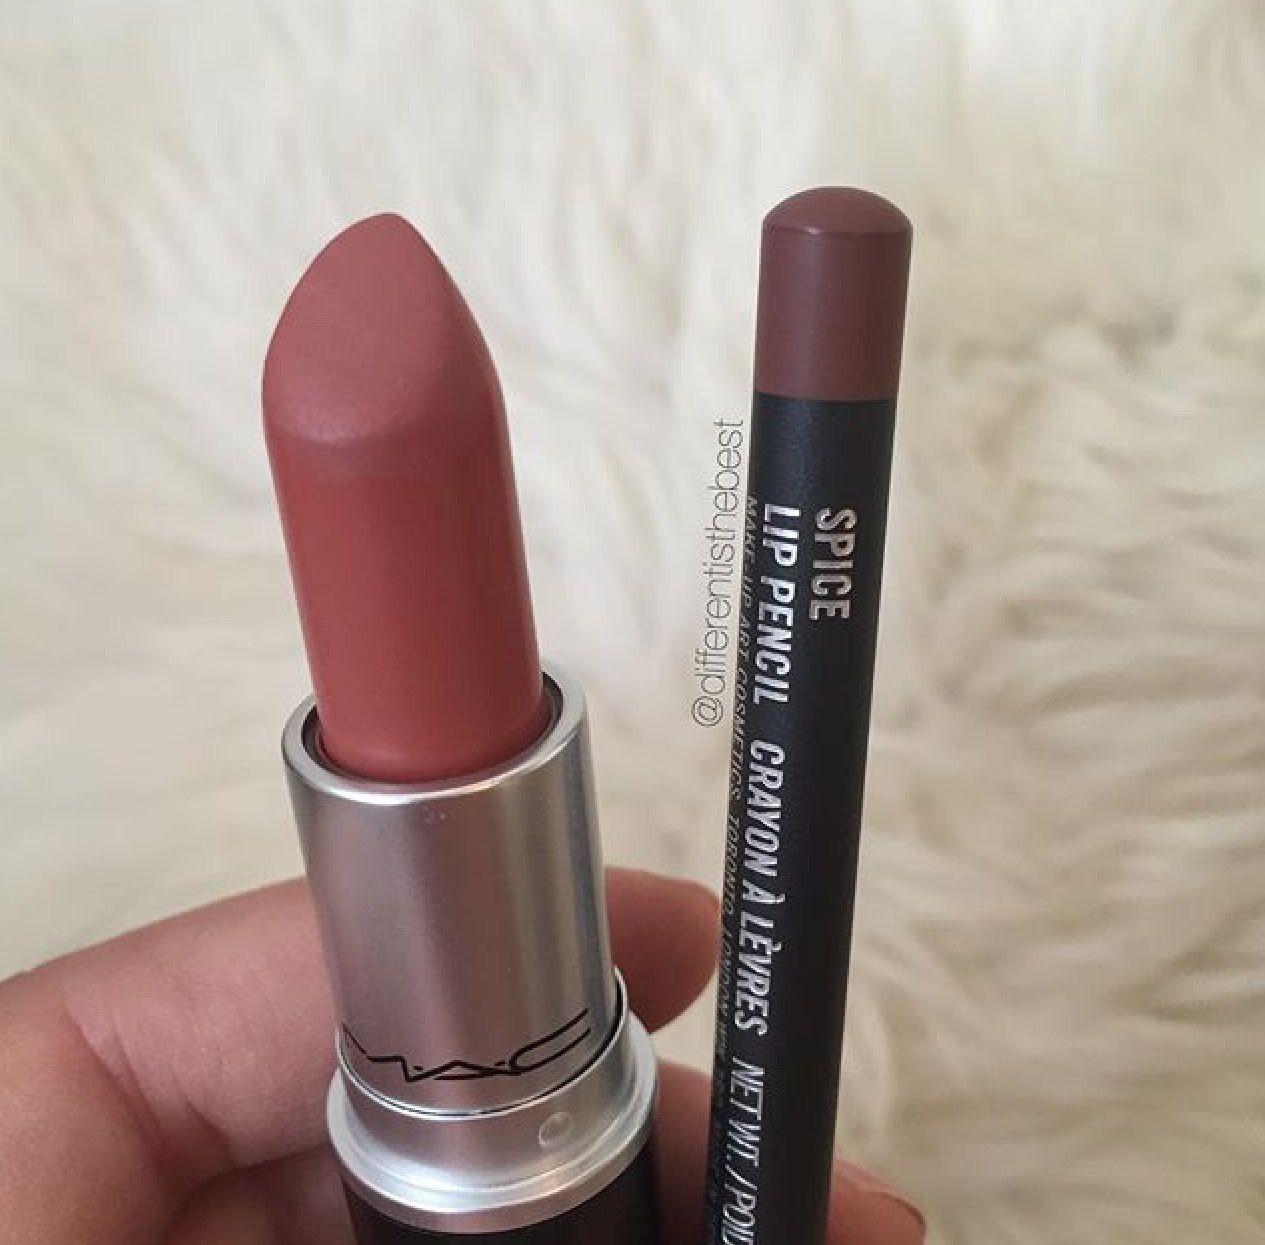 MAC Velvet Teddy & Spice lip pencil | MAC Lipsticks ...